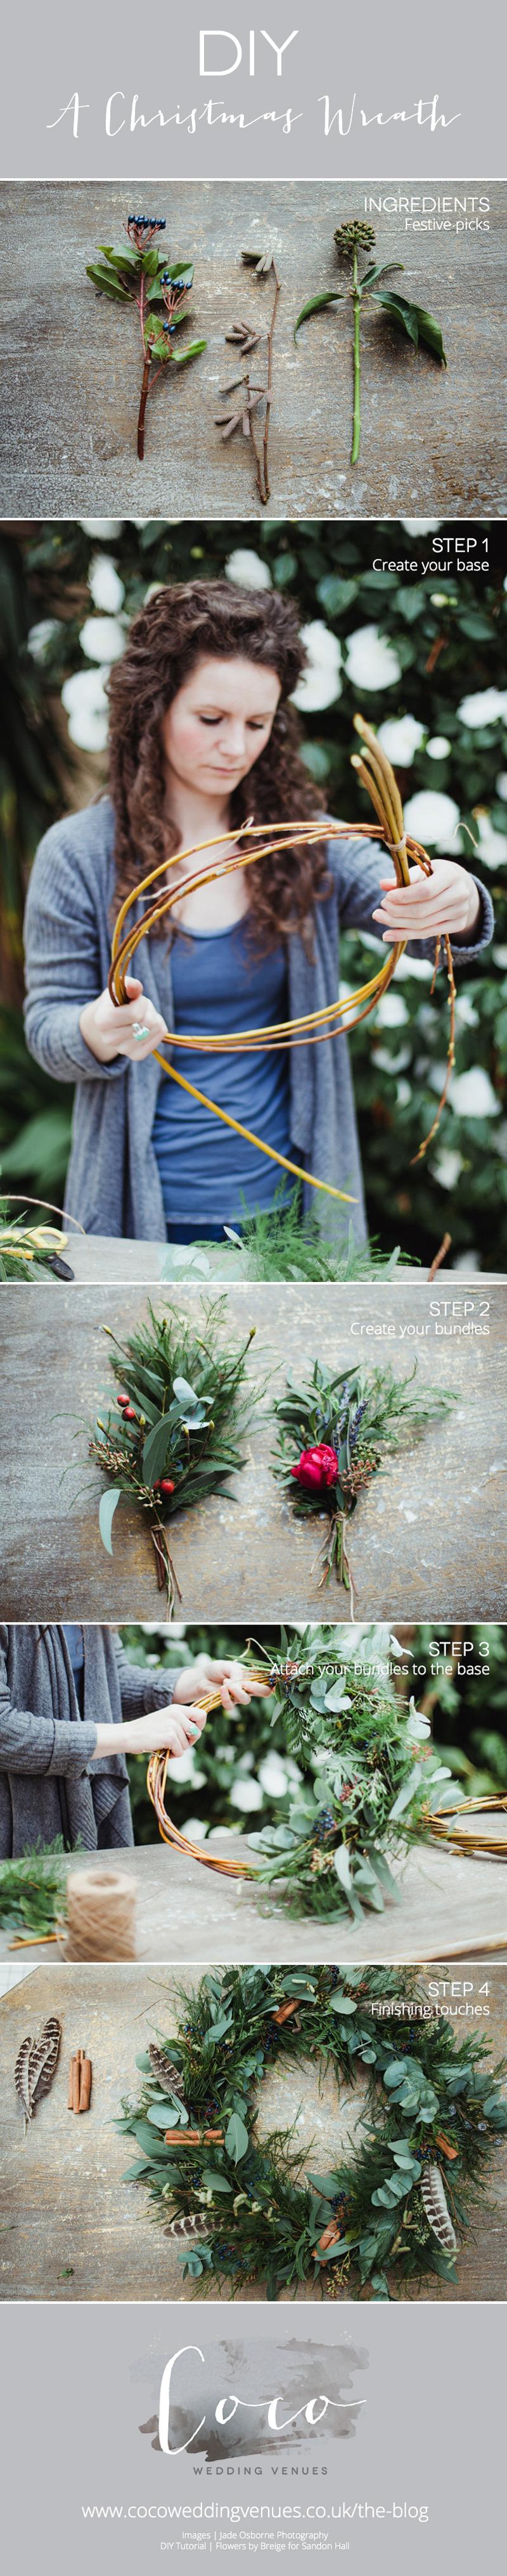 christmas-wreath-diy-flowers-by-breige-sandon-hall-wedding-venue-coco-wedding-venues-jade-osborne-photography-step-by-step-tutorial-1